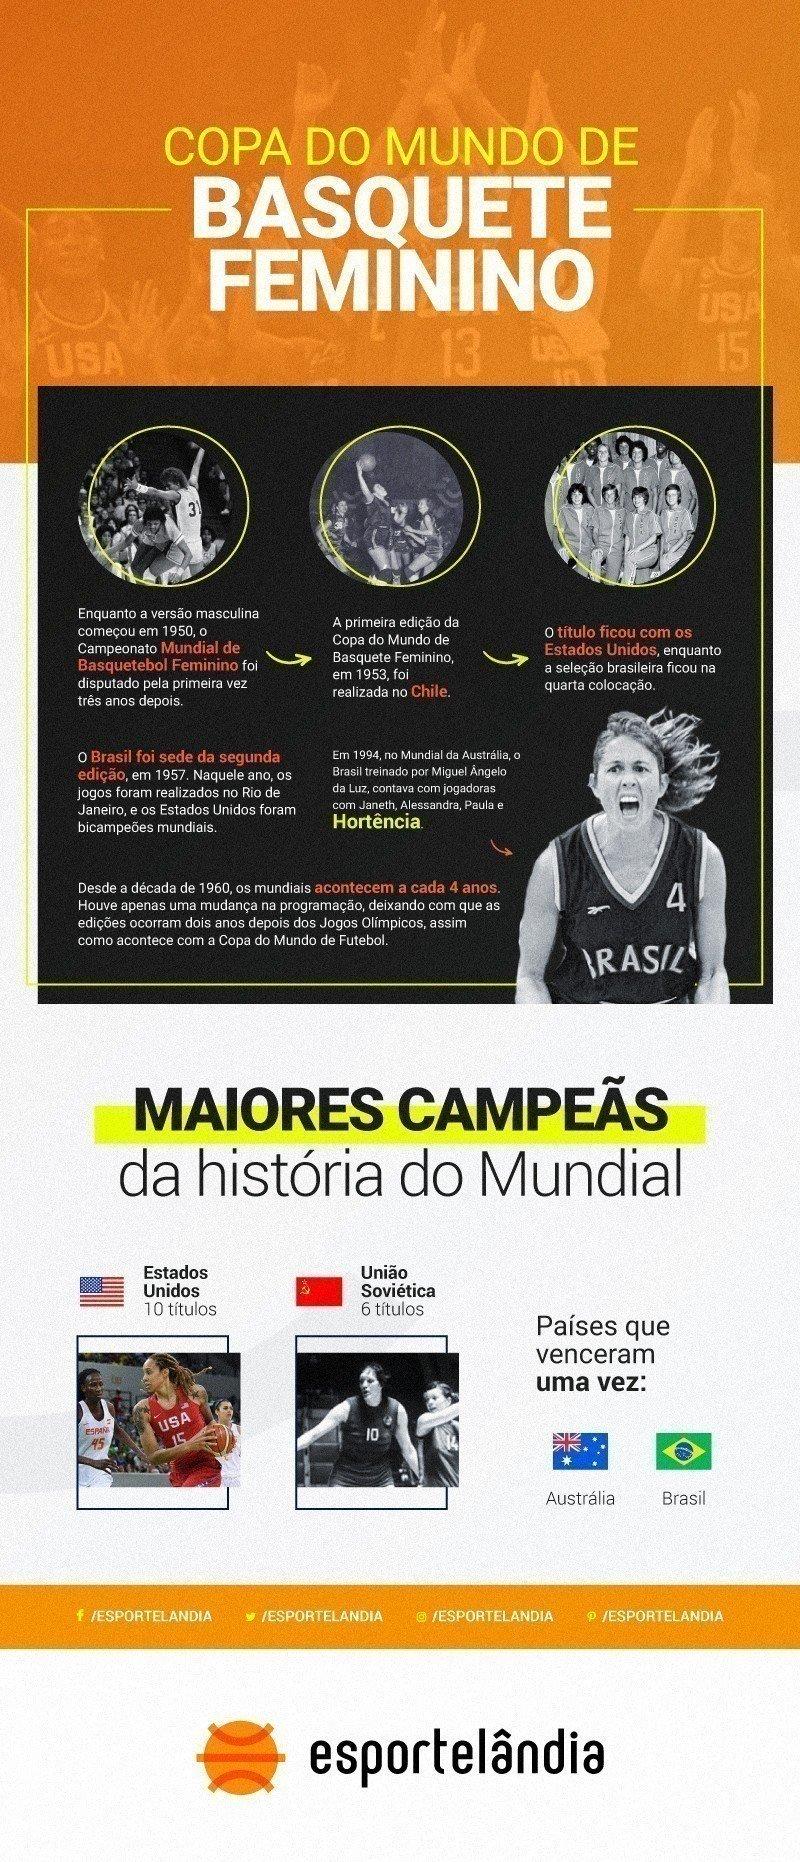 Copa do Mundo de Basquete Feminino